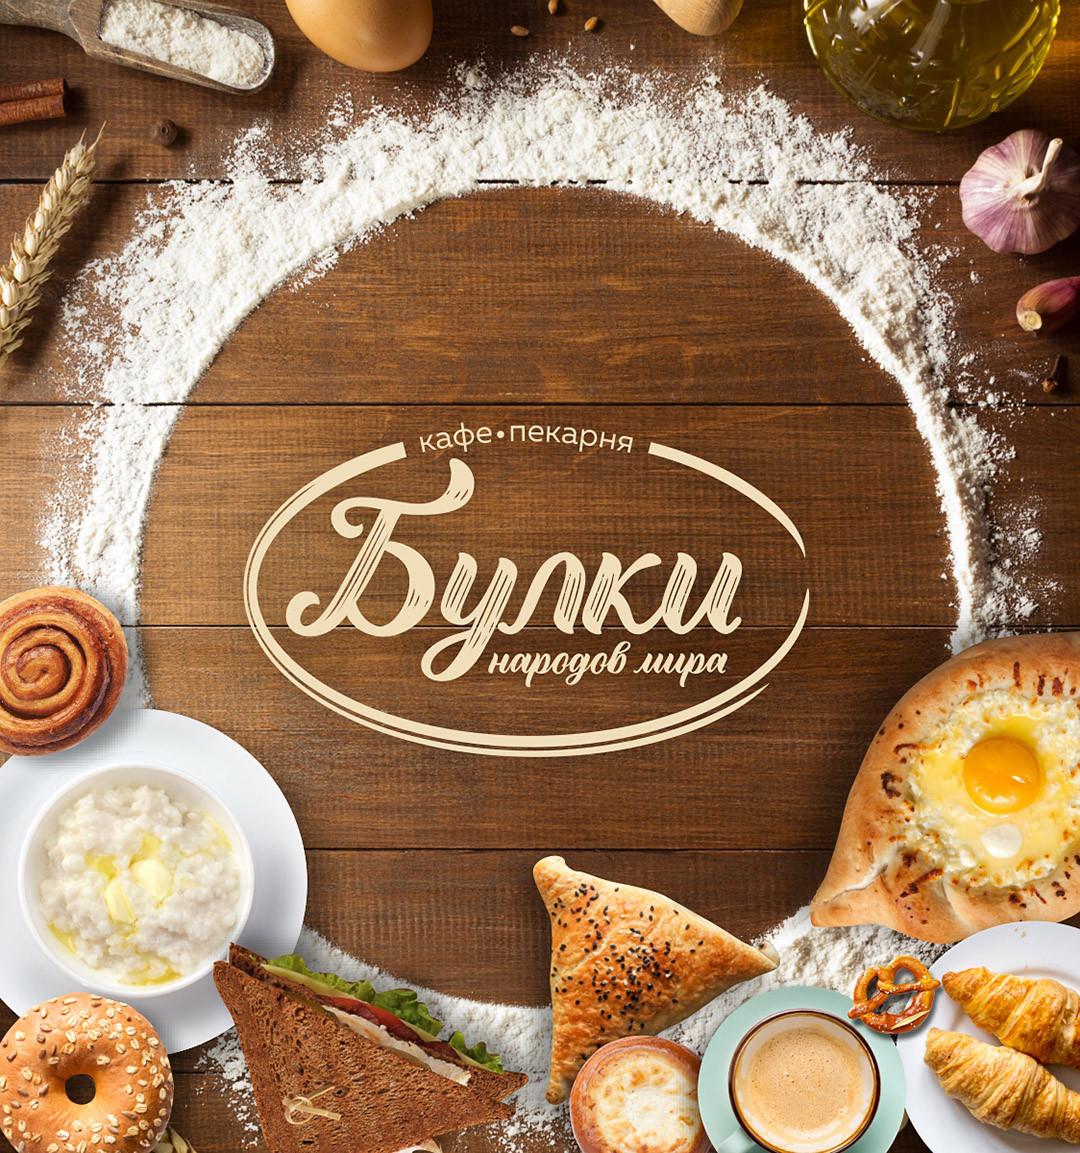 Реклама пекарни в картинках